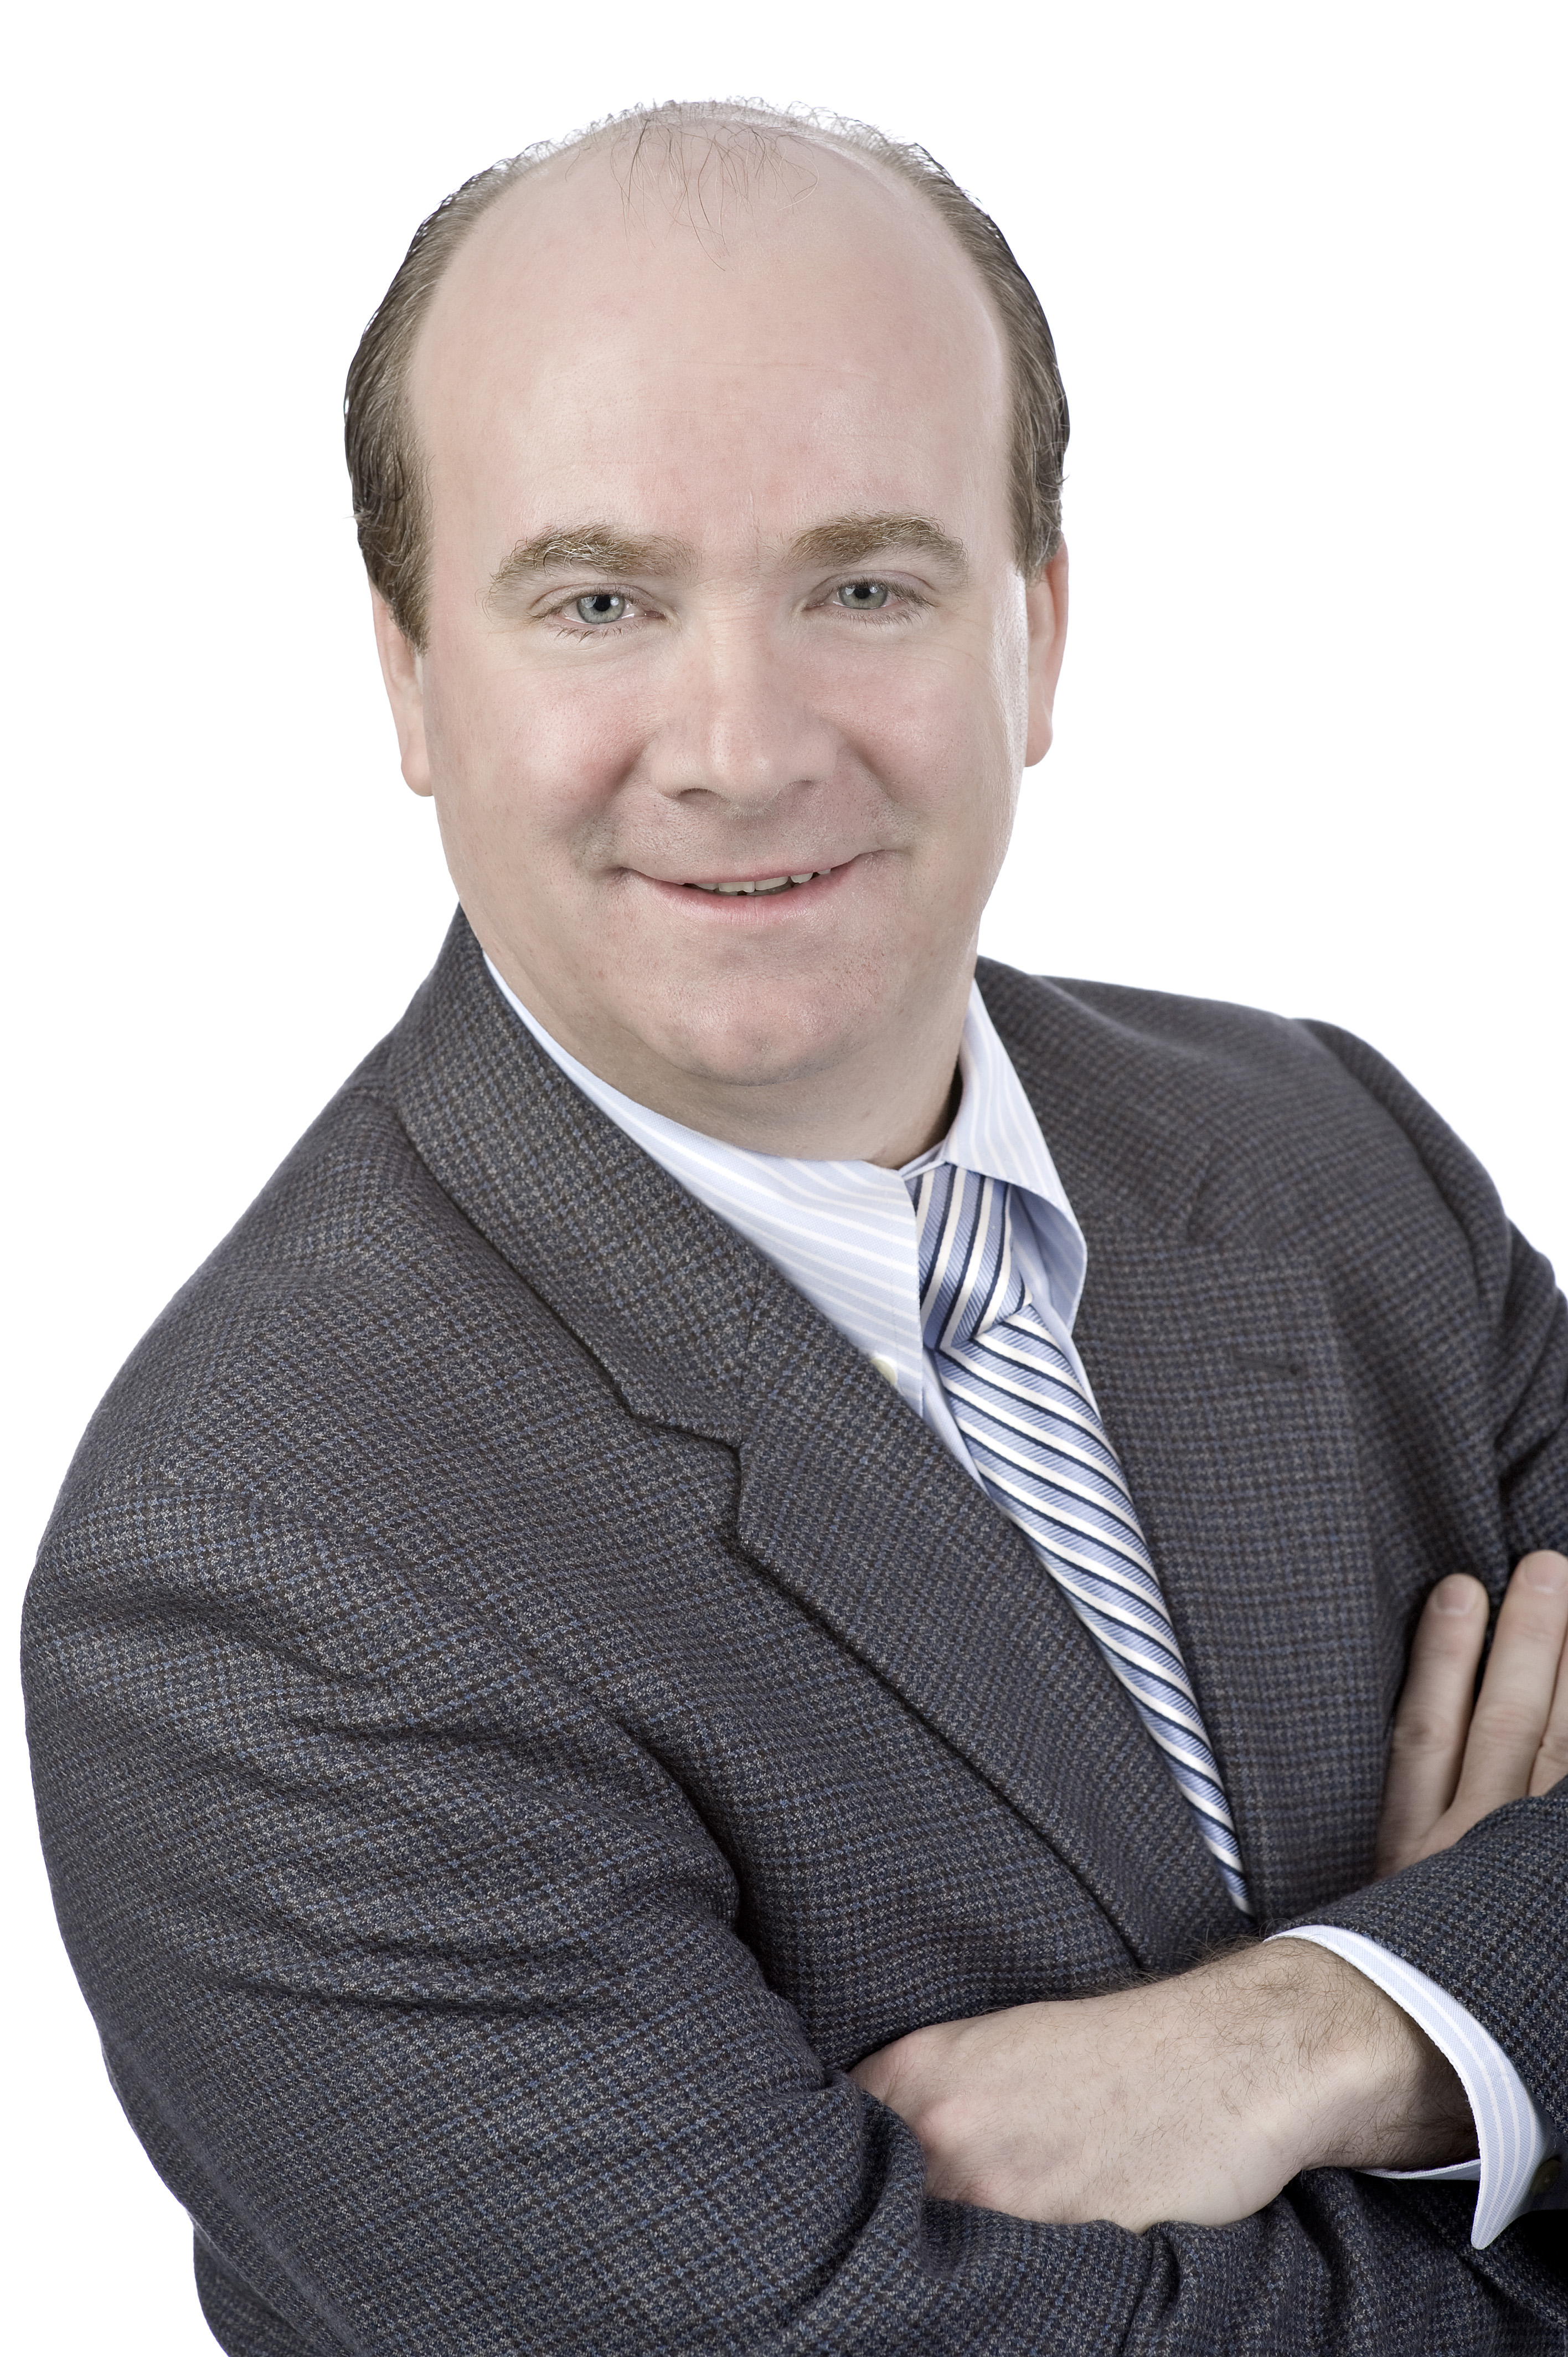 Daniel Crimmins, financial advisor Woodcliff Lake NJ